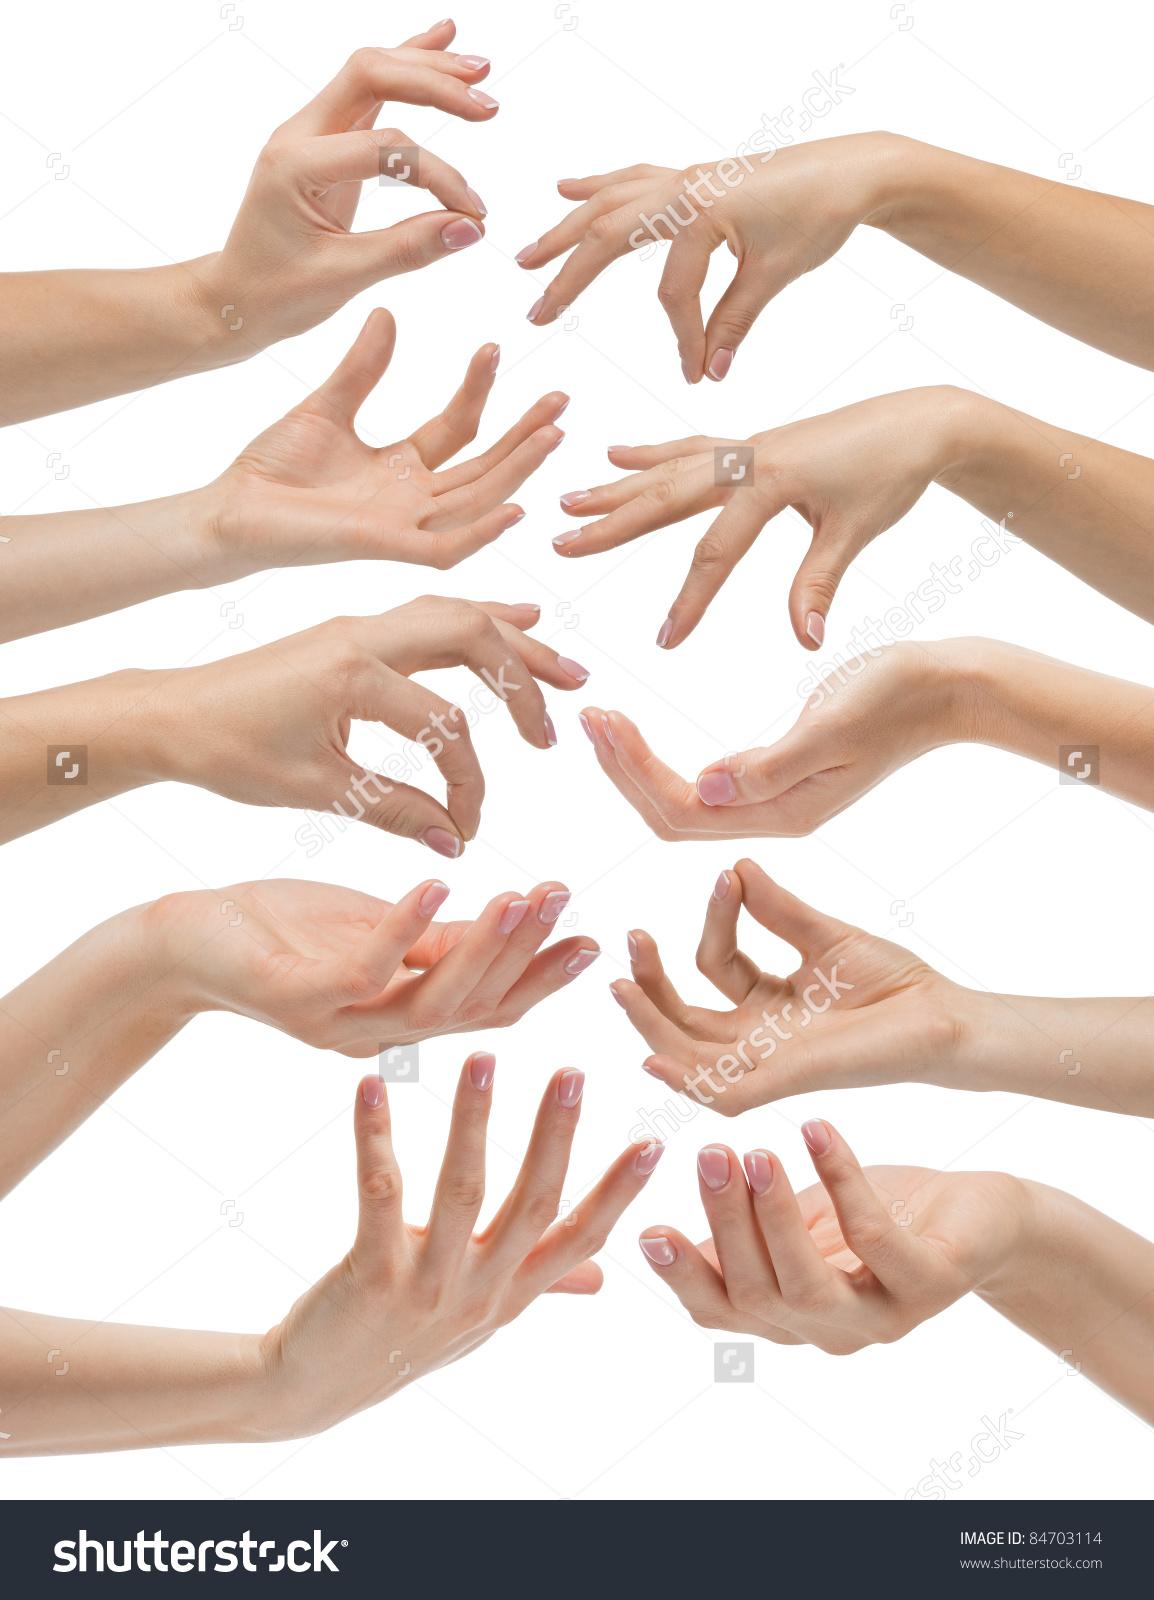 Hand Gesture #7